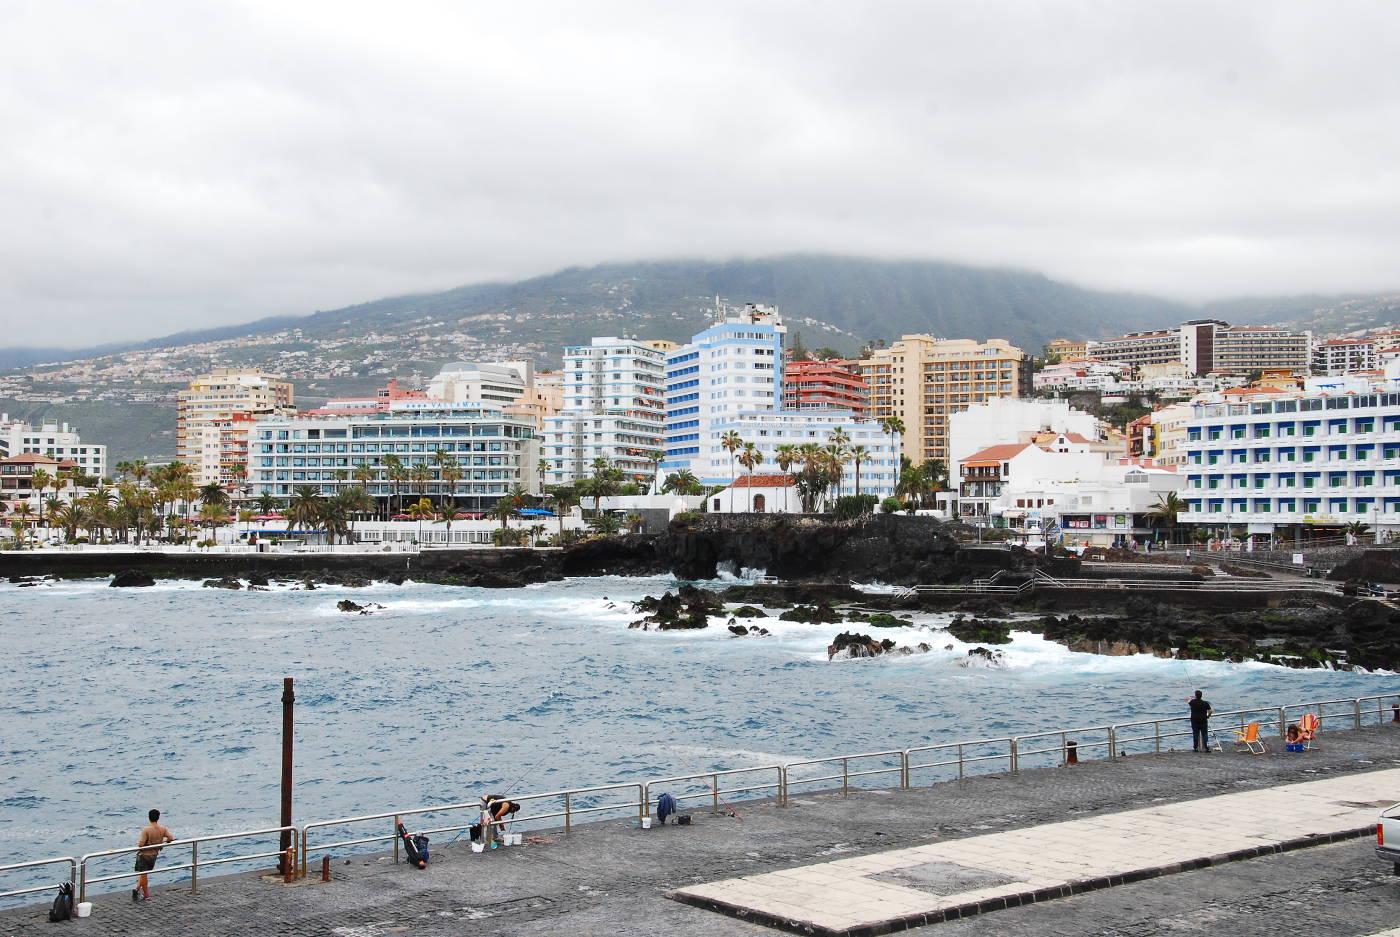 Puerto de la Cruz à Tenerife